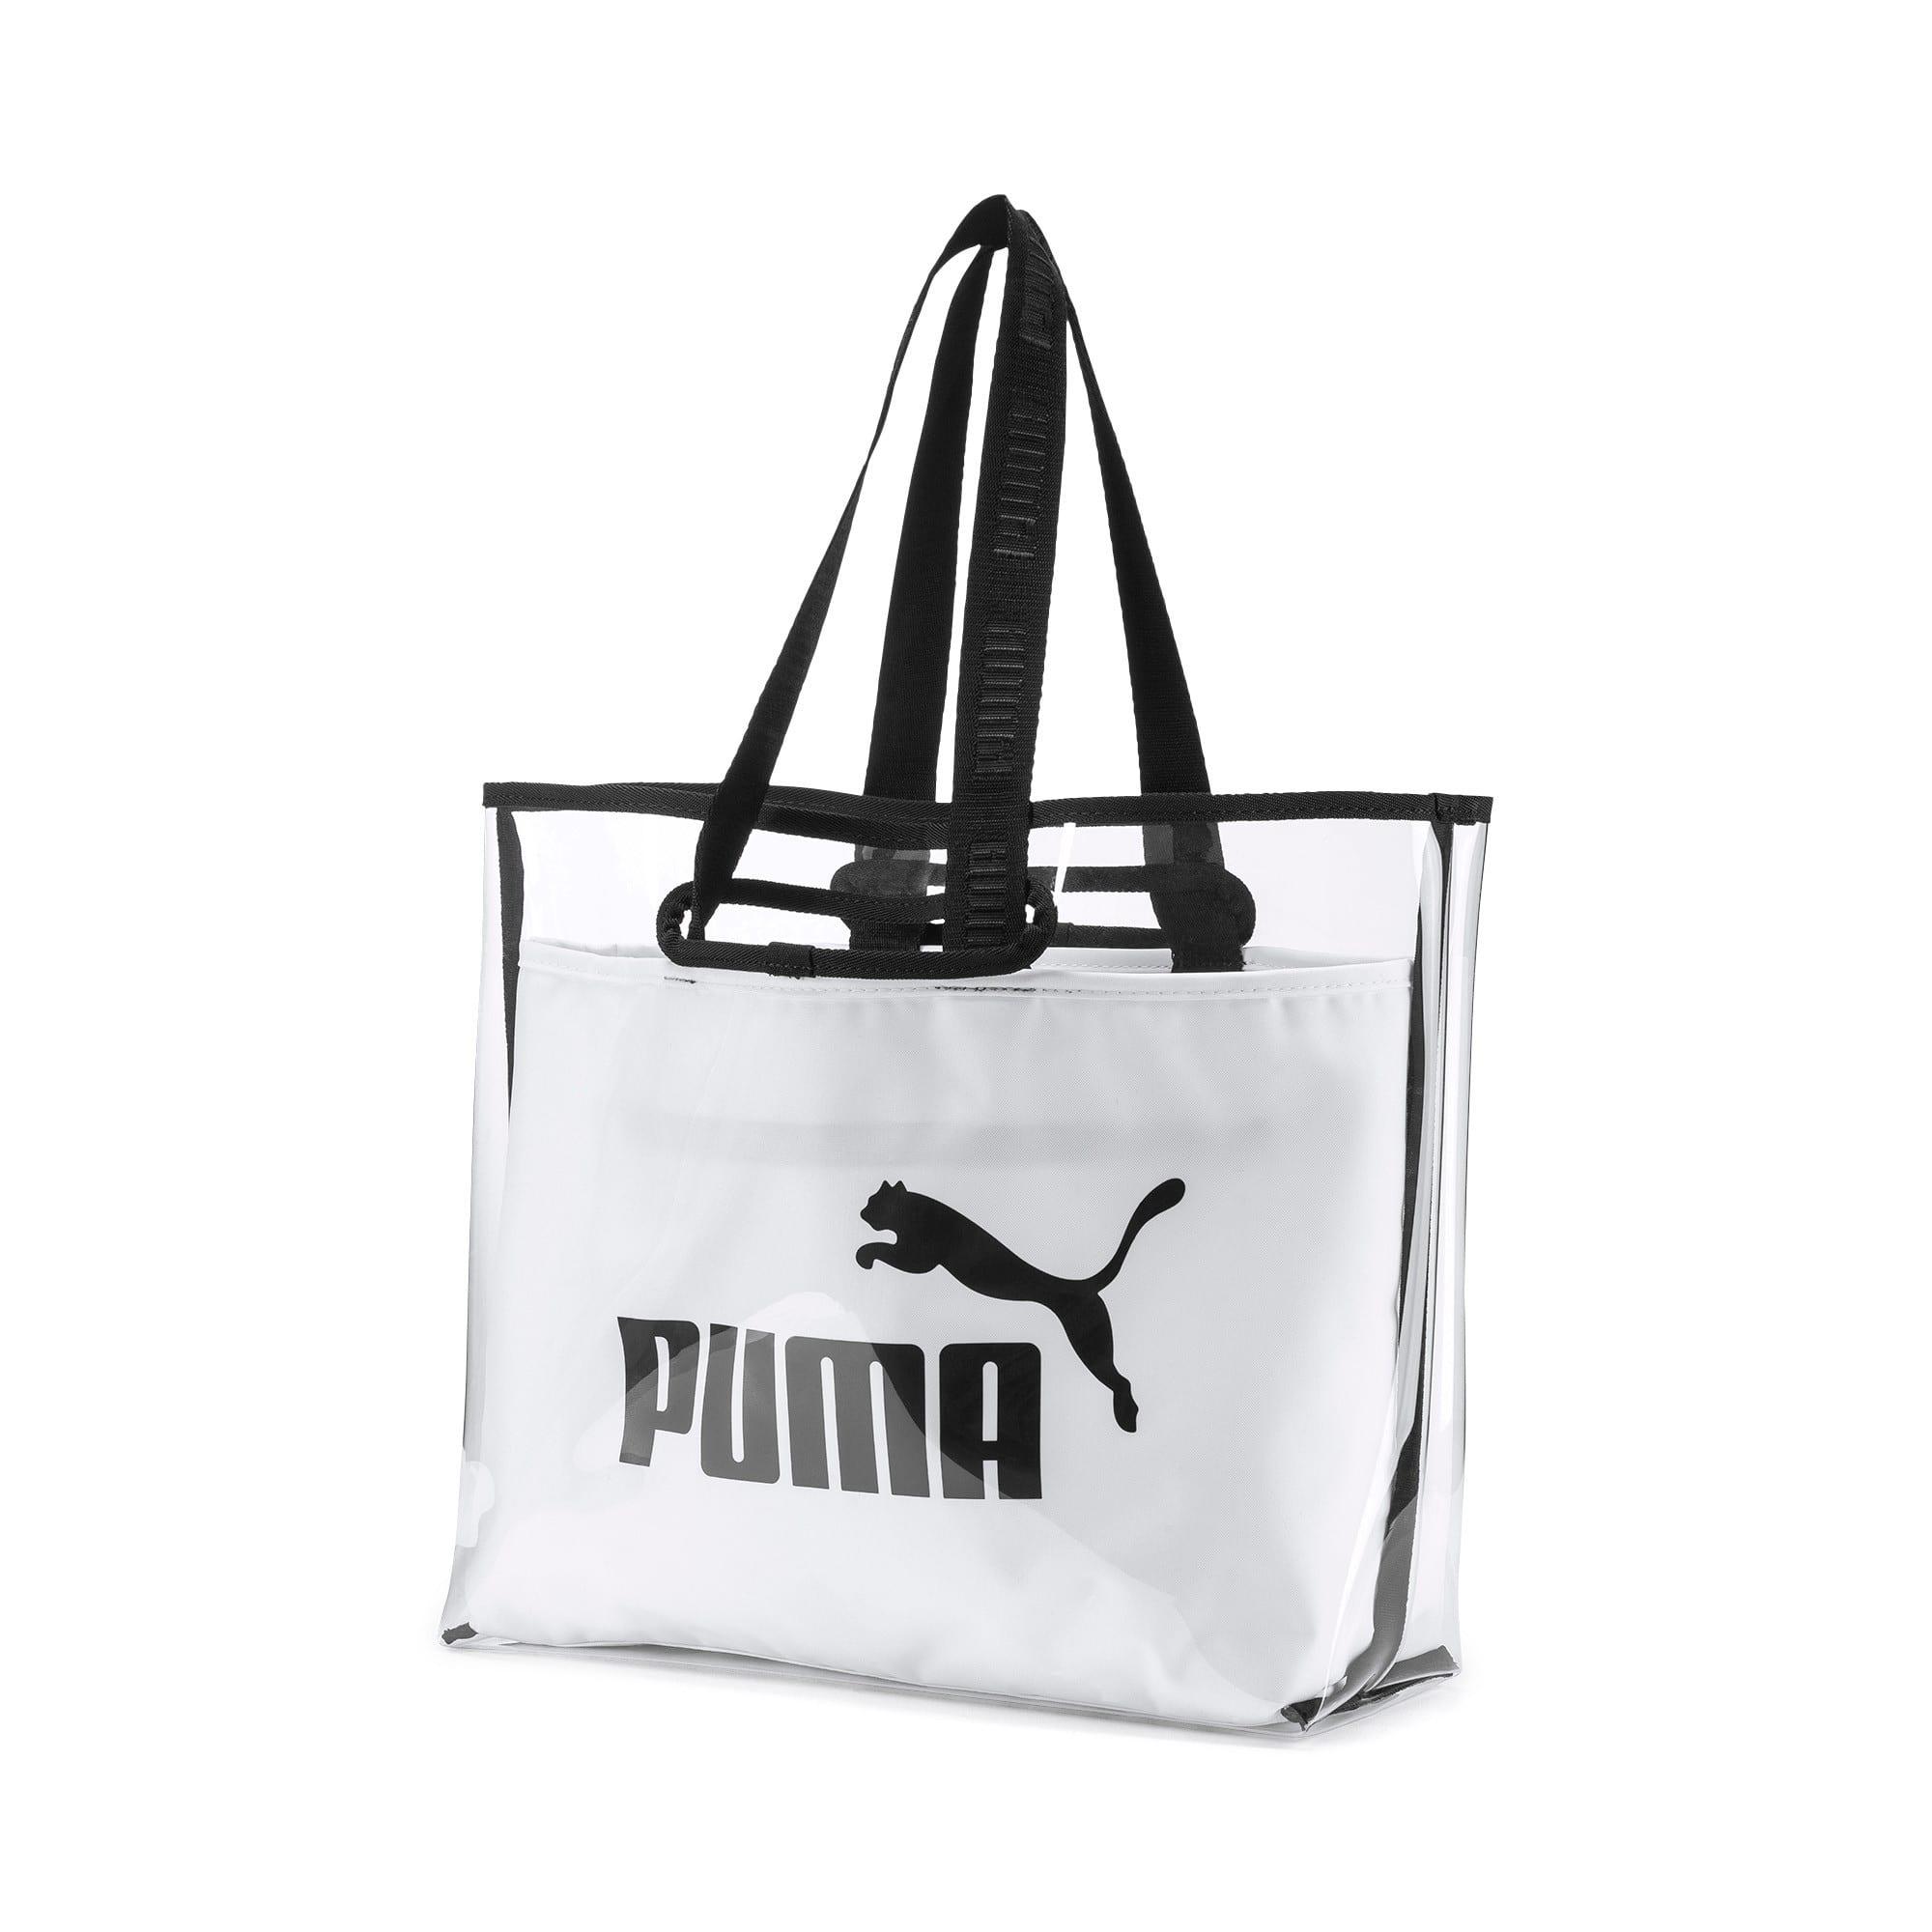 Thumbnail 2 of Women's Twin Shopper, Puma White, medium